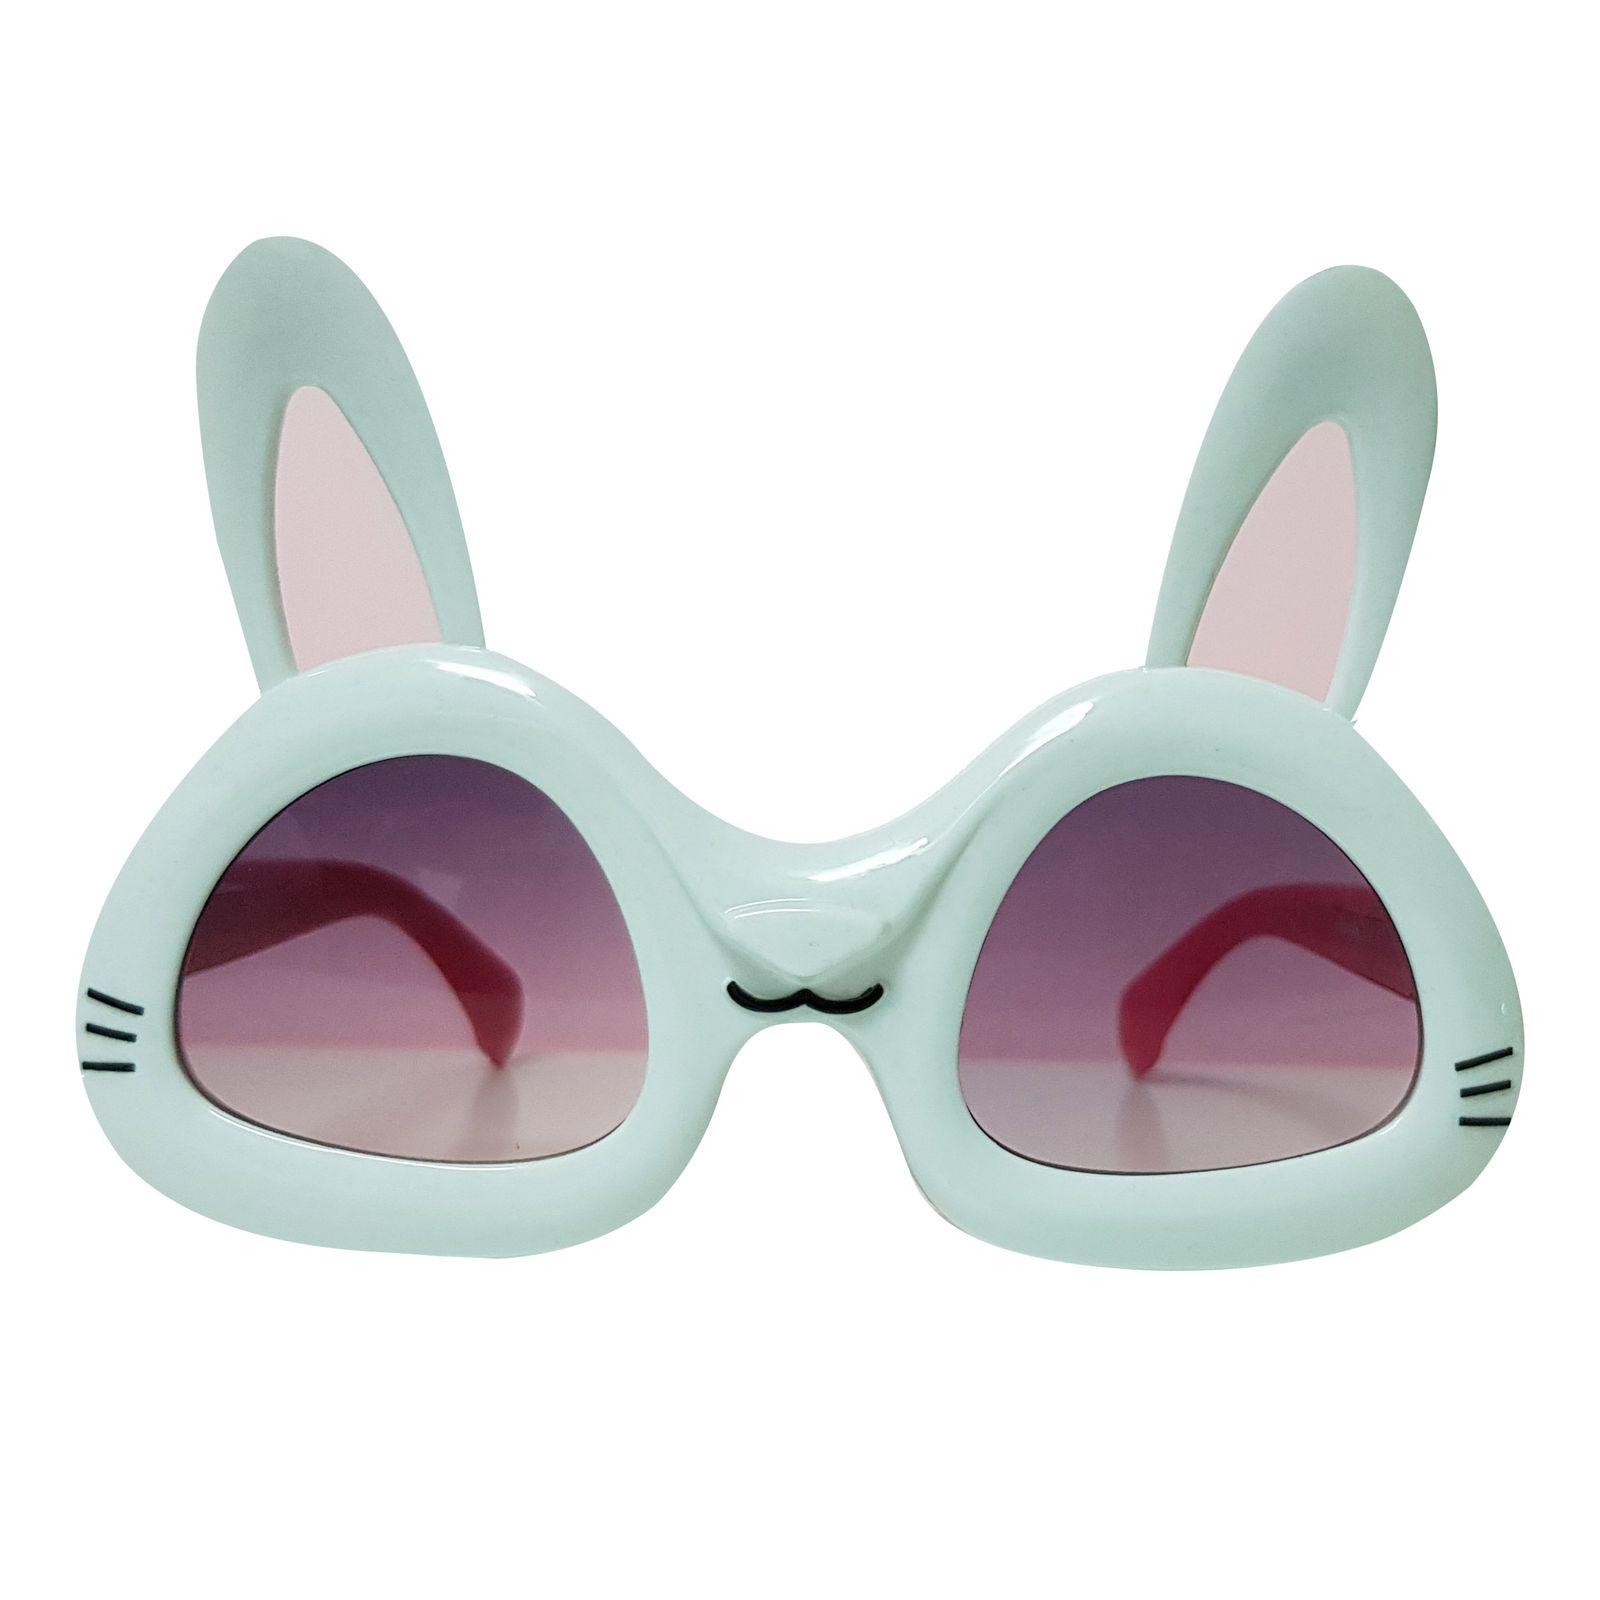 عینک آفتابی بچگانه طرح خرگوش کد KD61004 -  - 2